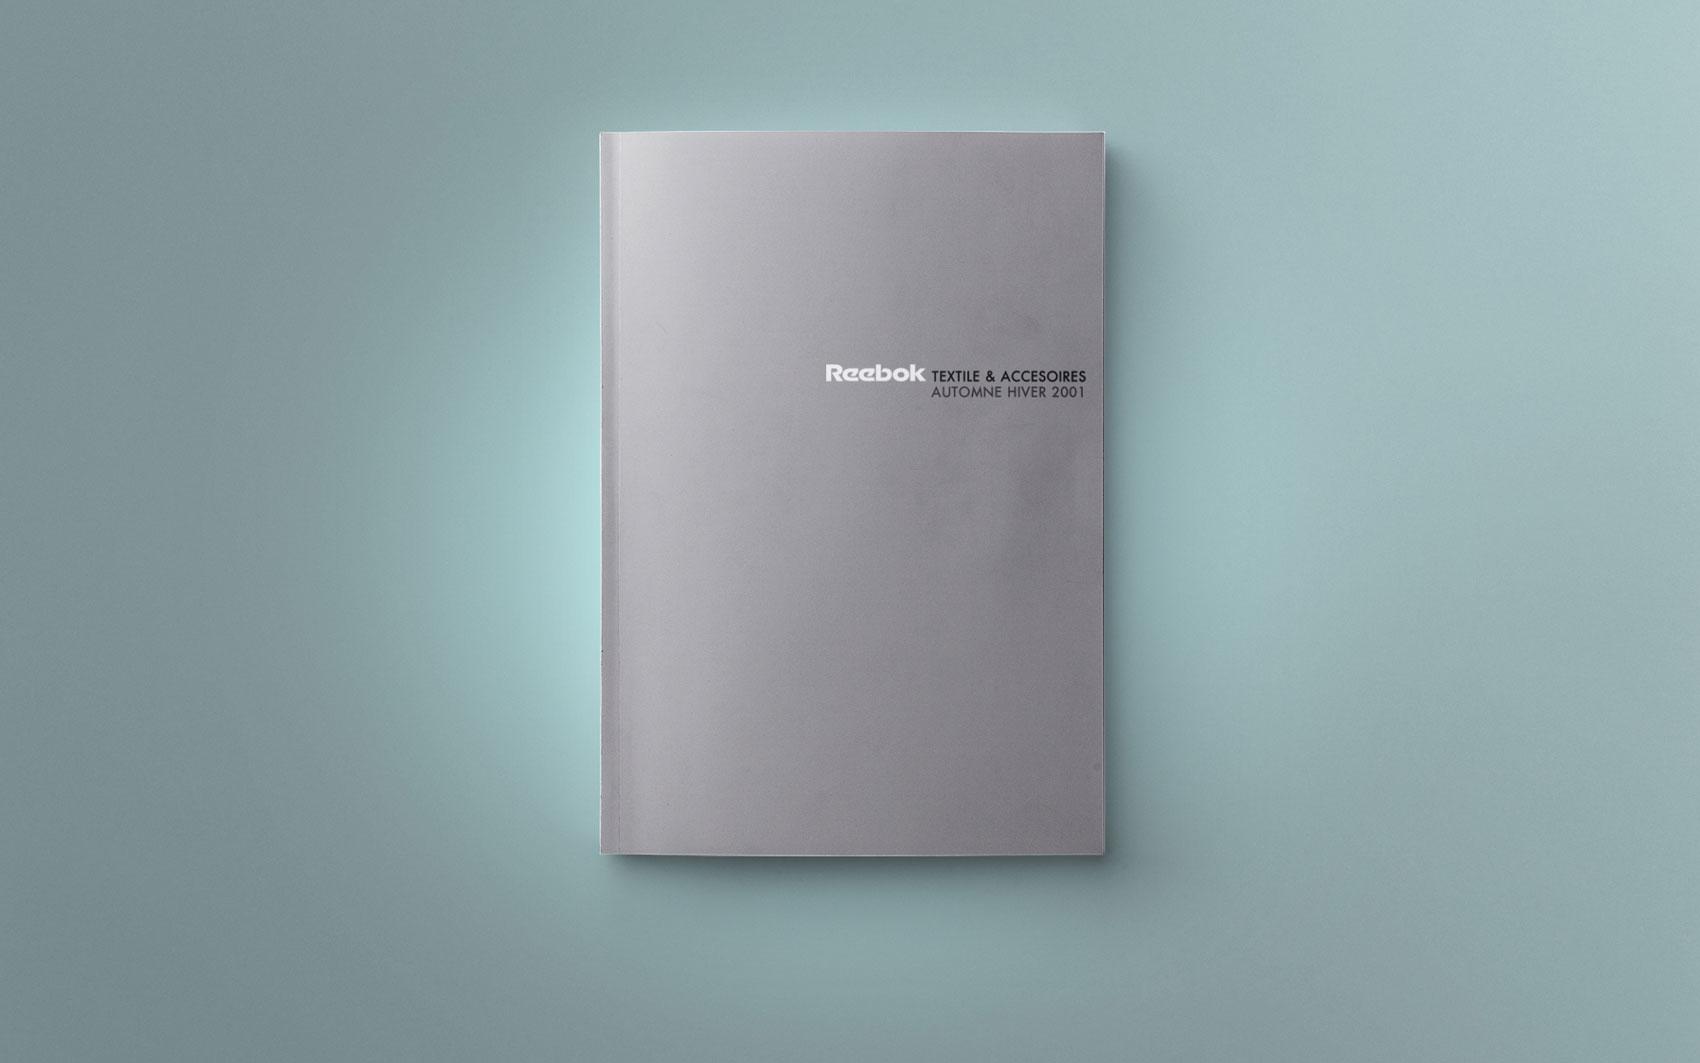 catalogue-reebok-automne-hiver-11